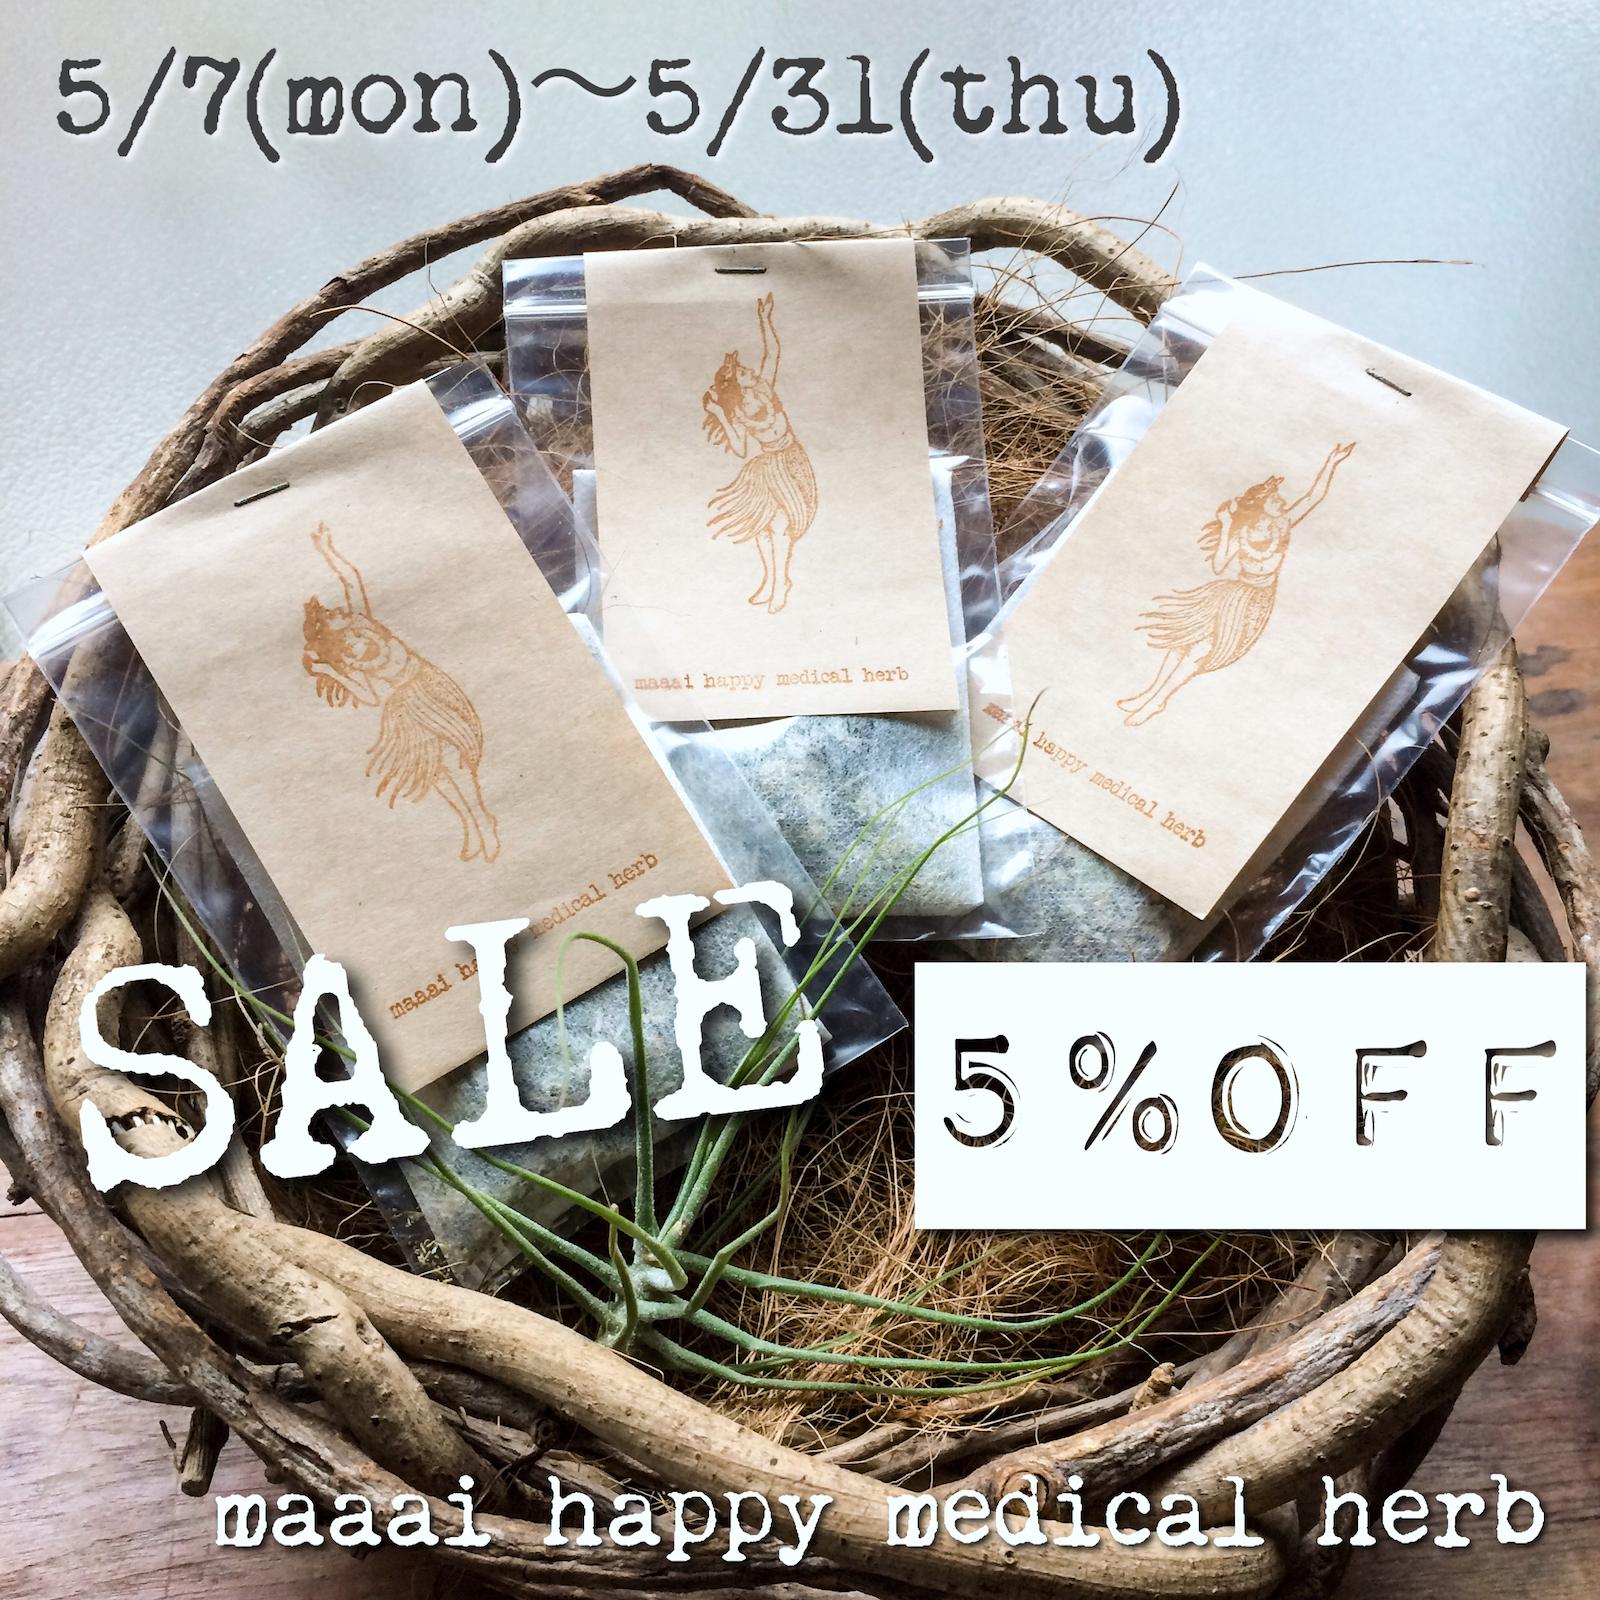 【5%OFF SALE!!!】5/7(mon)〜5/31(thu)